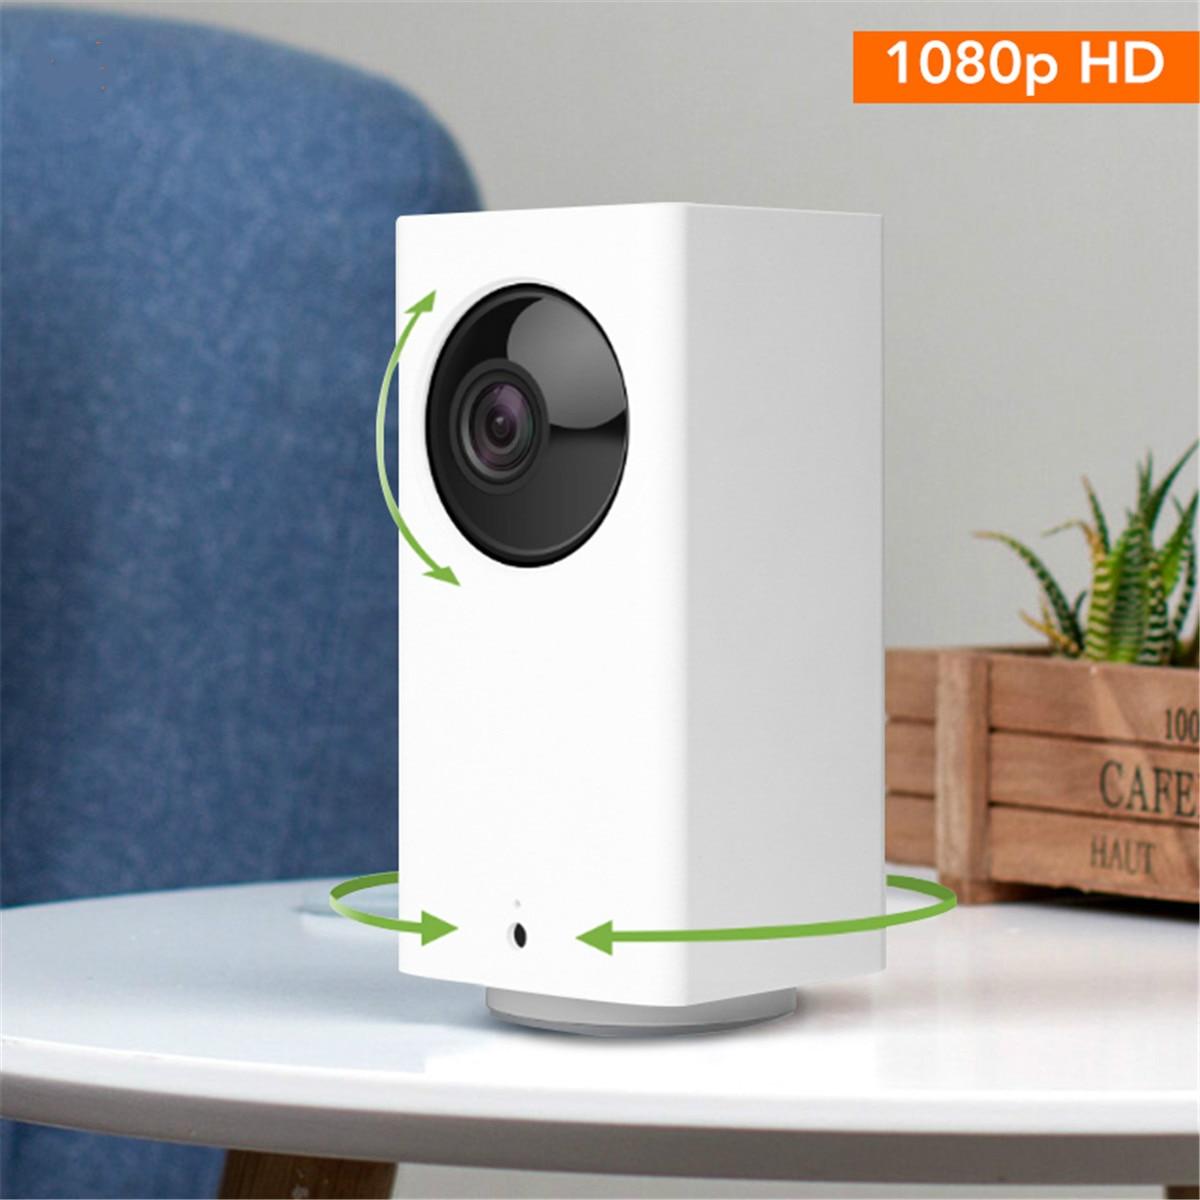 Xiaomi Mijia YOUPIN DAFANG 1080p caméra IP caméra intelligente WIFI moniteur Intelligent HD Vision nocturne intelligente caméra vidéo de bureau à domicile